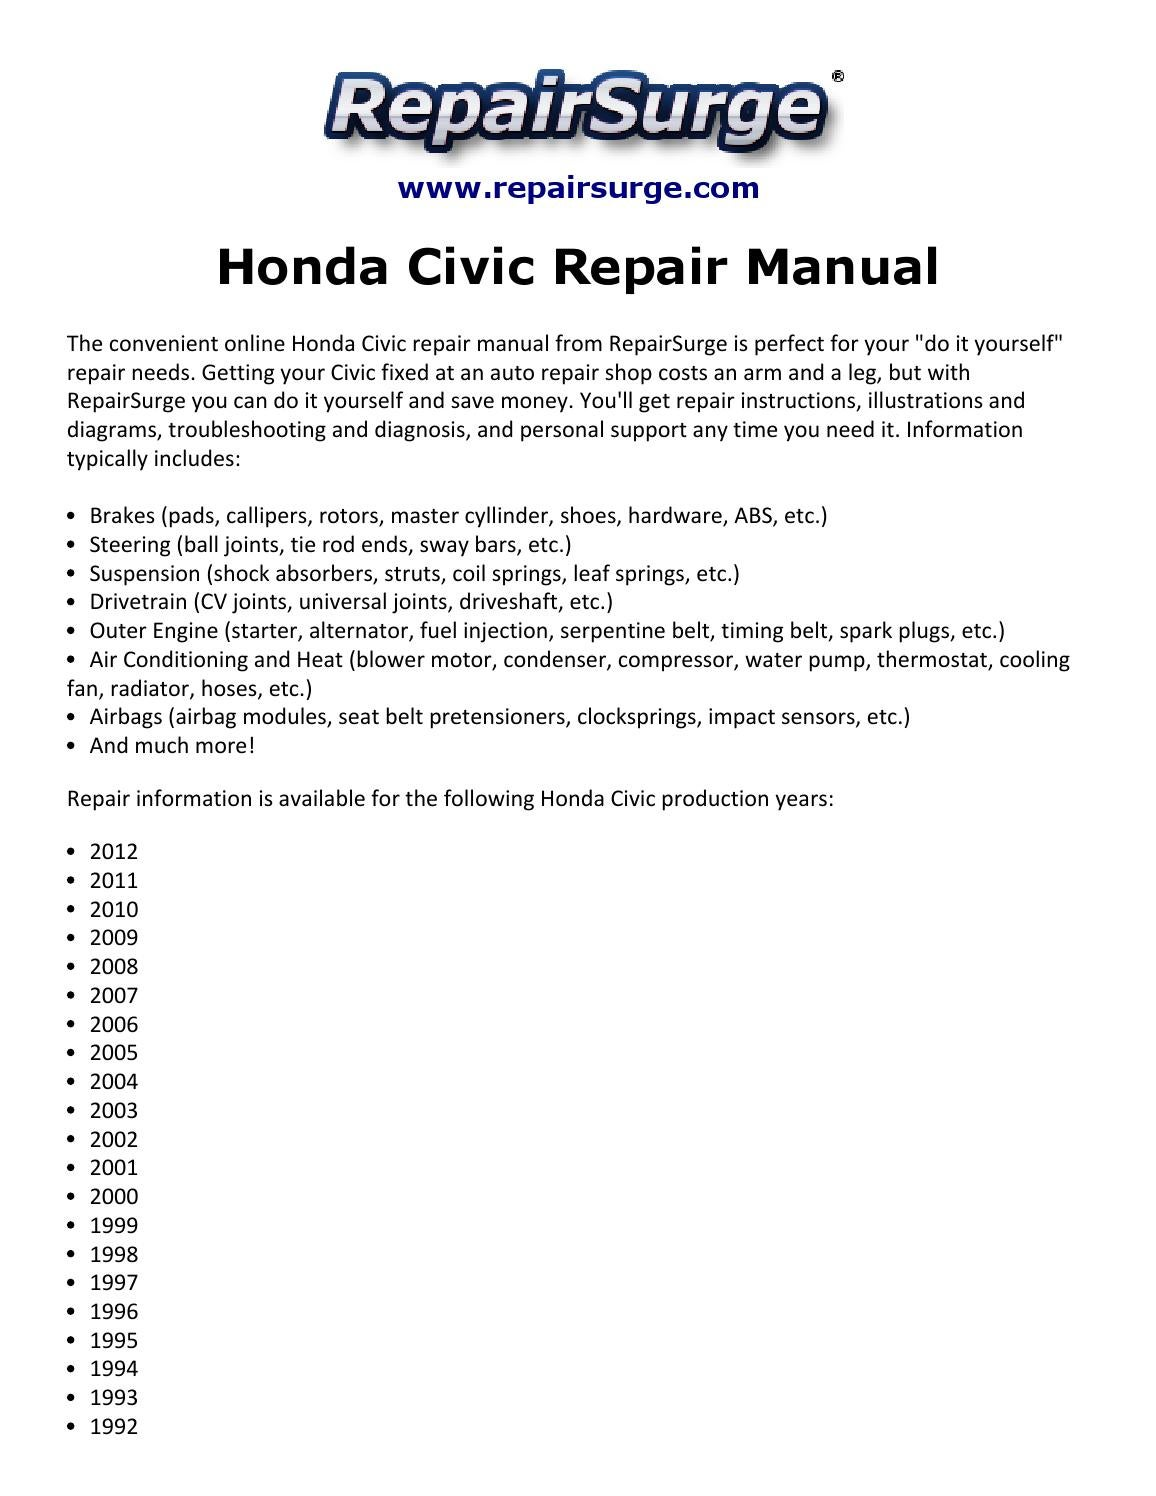 honda civic repair manual 1990 2012 by arrack 555 issuu rh issuu com 1996 Honda  Civic Hatchback 1998 Honda Civic Ex Manual